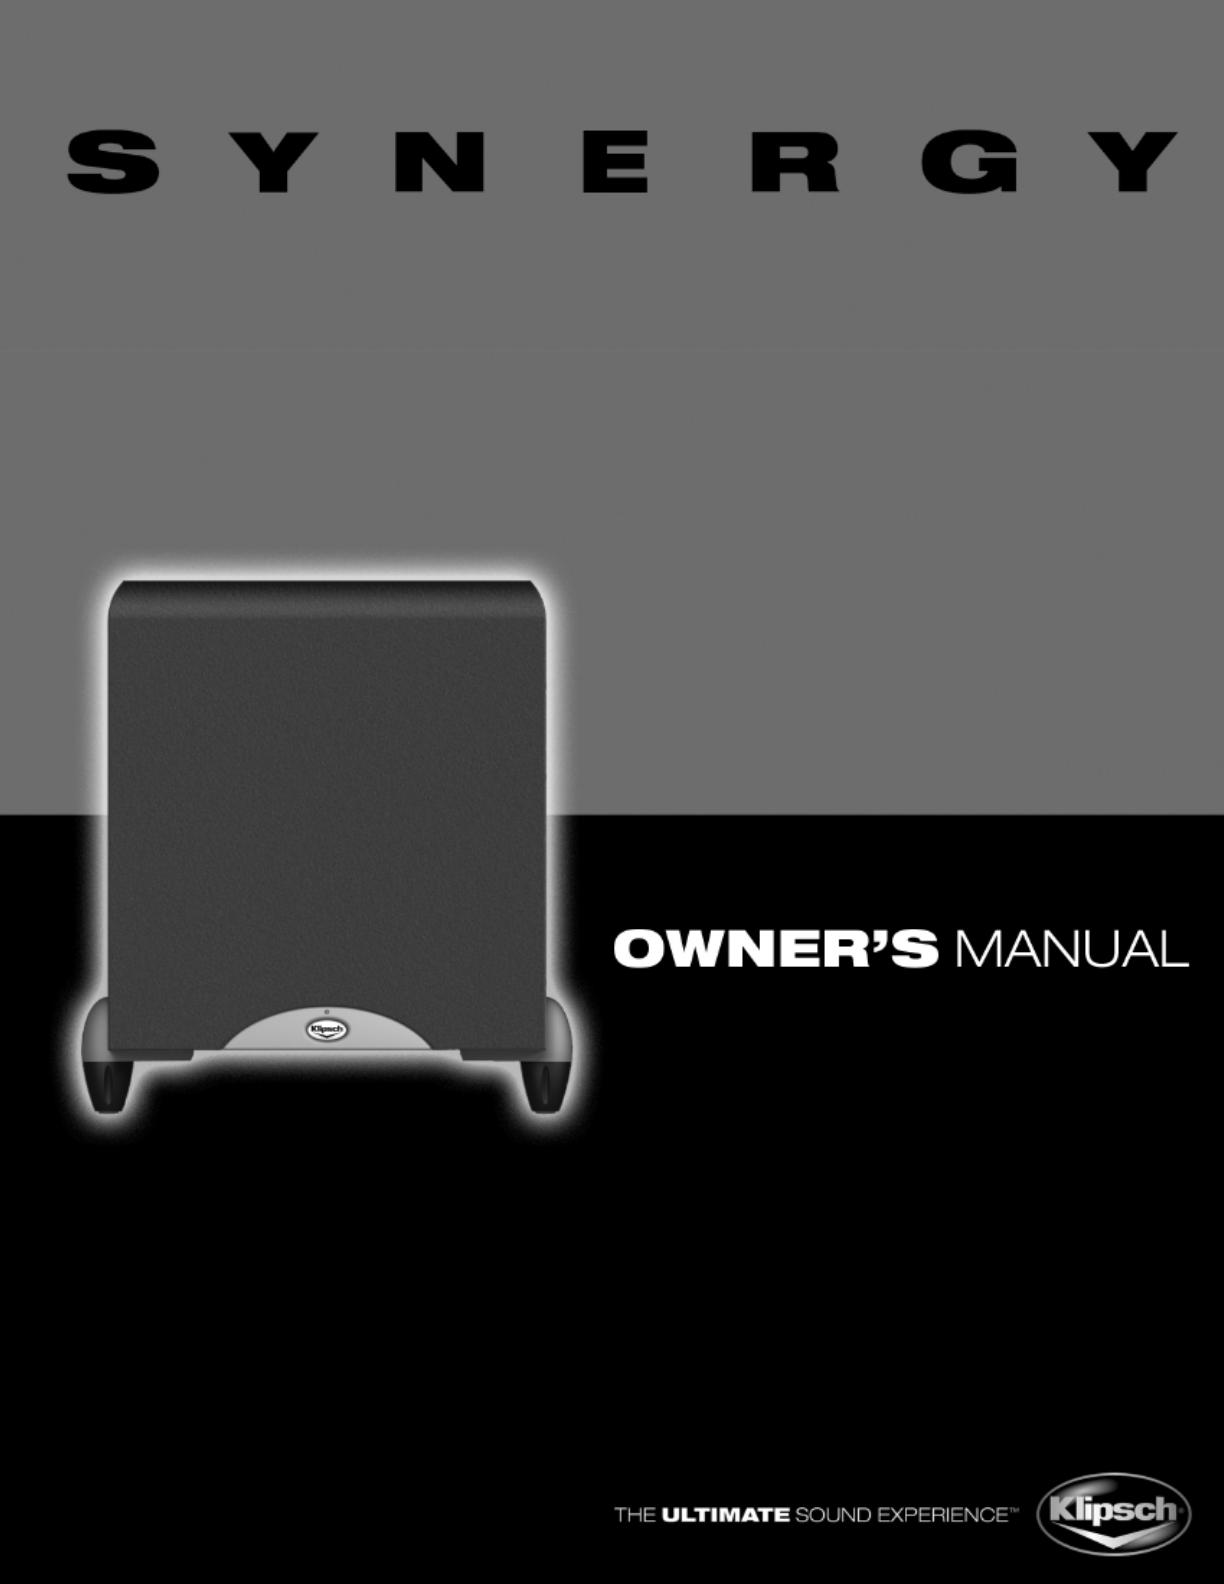 Klipsch SUB-10 manual on klipsch sw ii 8, klipsch synergy diagram 12, klipsch sub-12hg, klipsch ksw 10 manual, klipsch promedia 5 1 amp repair, klipsch thx computer connect to desktop, klipsch promedia v 2 400 repair,